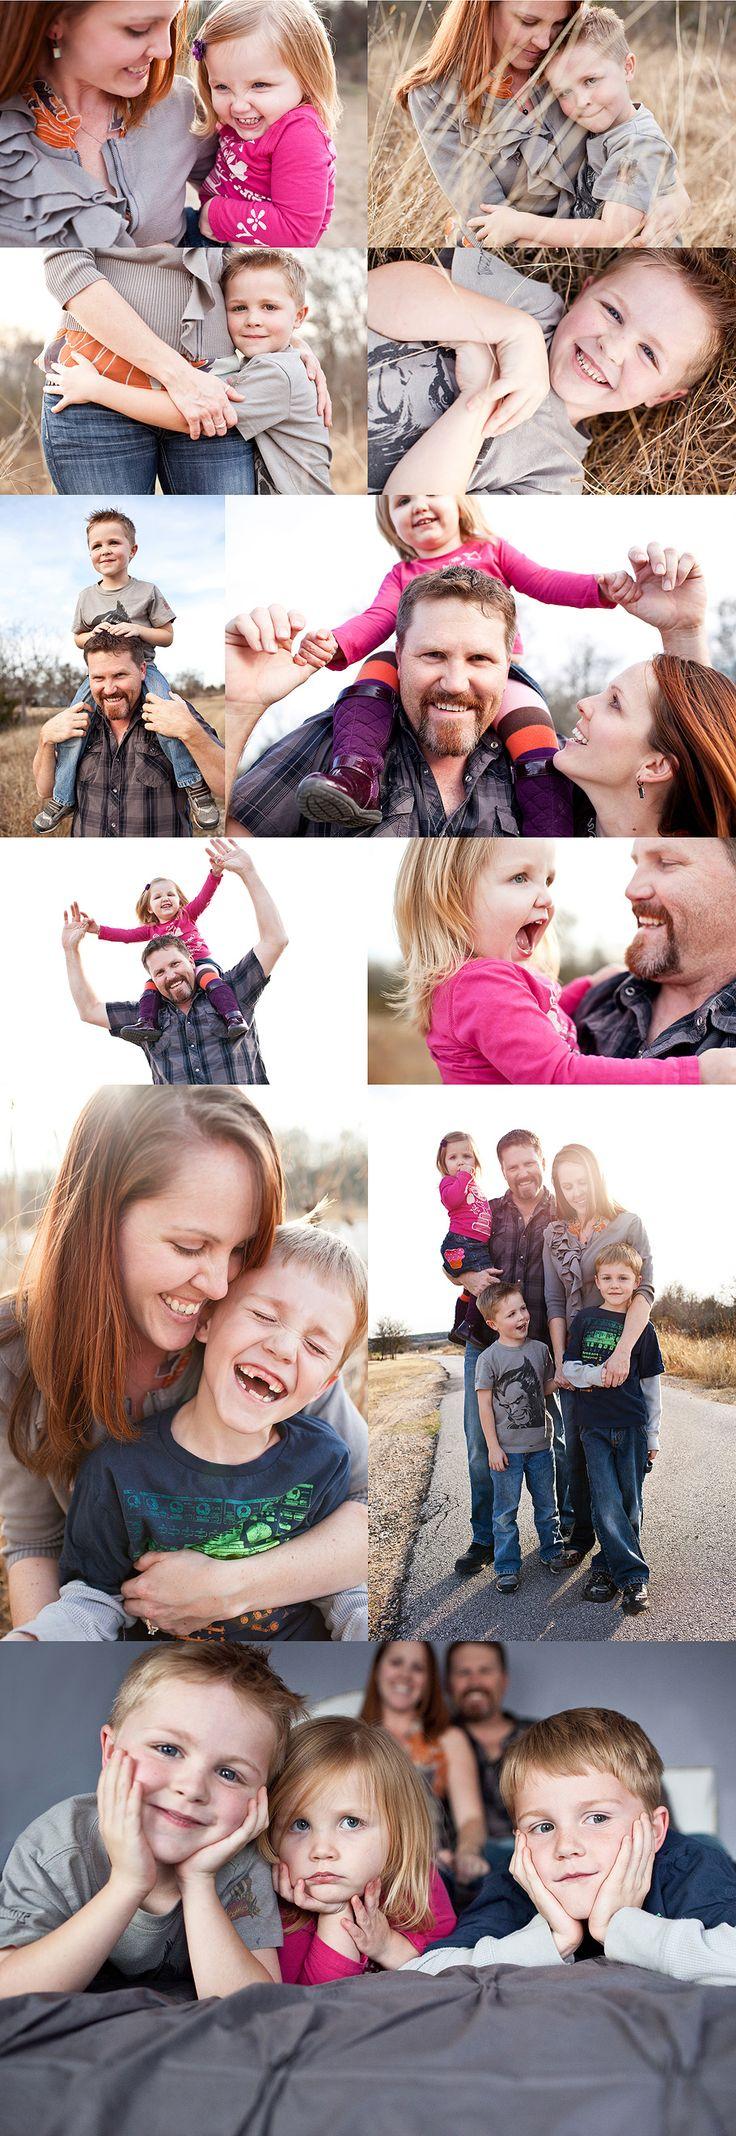 familyFamilies Photos Shoots, Photos Ideas, Families Photos Session, Families Shoots, Families Pictures, Outdoor Photography, Family Photo Shoots, Families Pics, Families Portraits